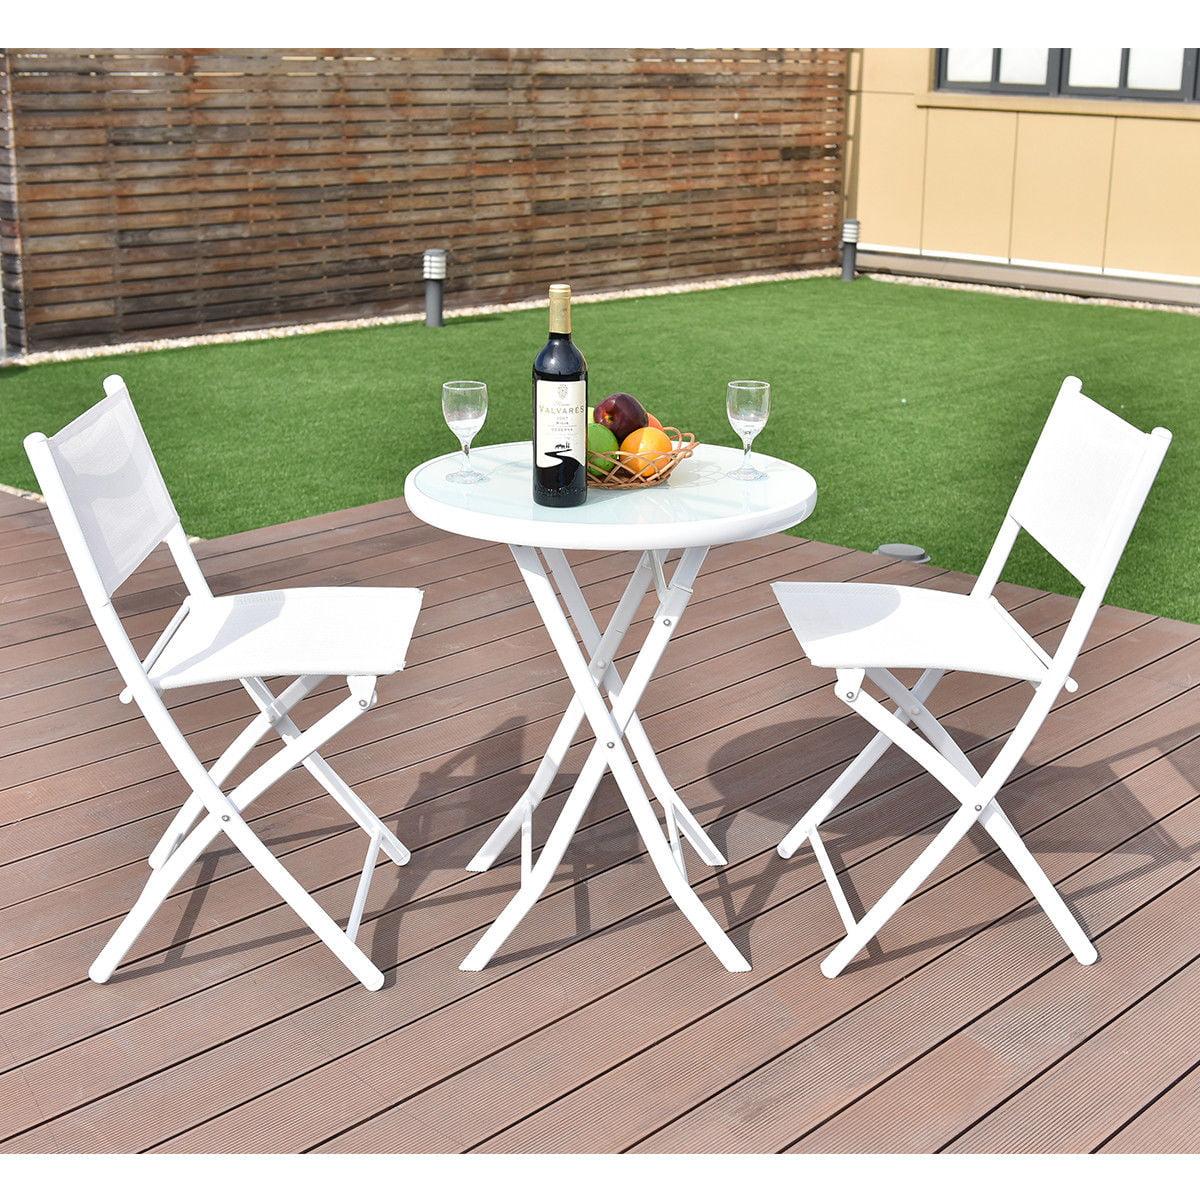 costway 3 pcs folding bistro table chairs set garden backyard patio furniture white walmart com